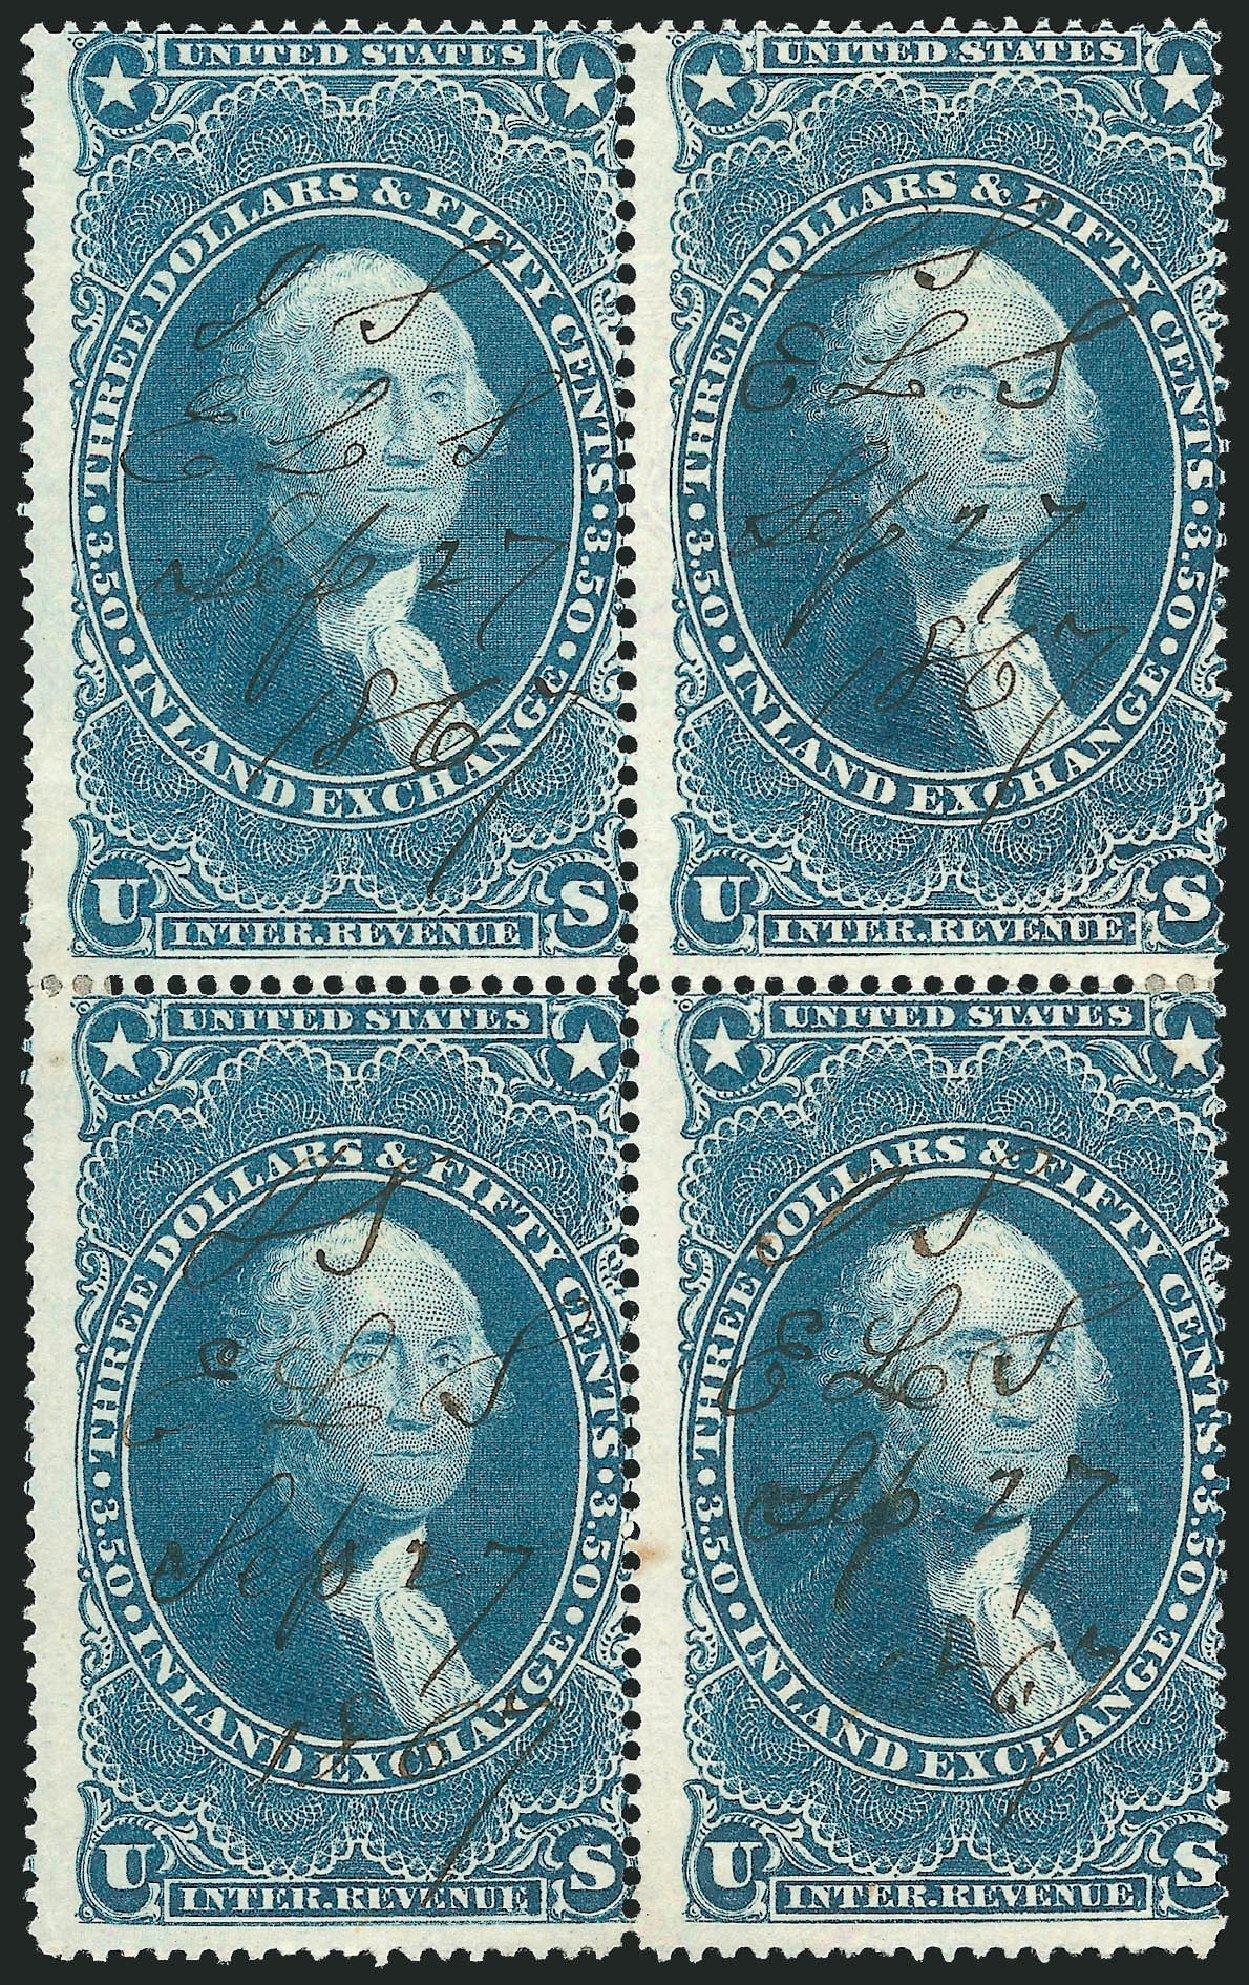 US Stamp Values Scott #R87: 1863 US$3.50 Revenue Inland Exchange. Robert Siegel Auction Galleries, Dec 2014, Sale 1089, Lot 436